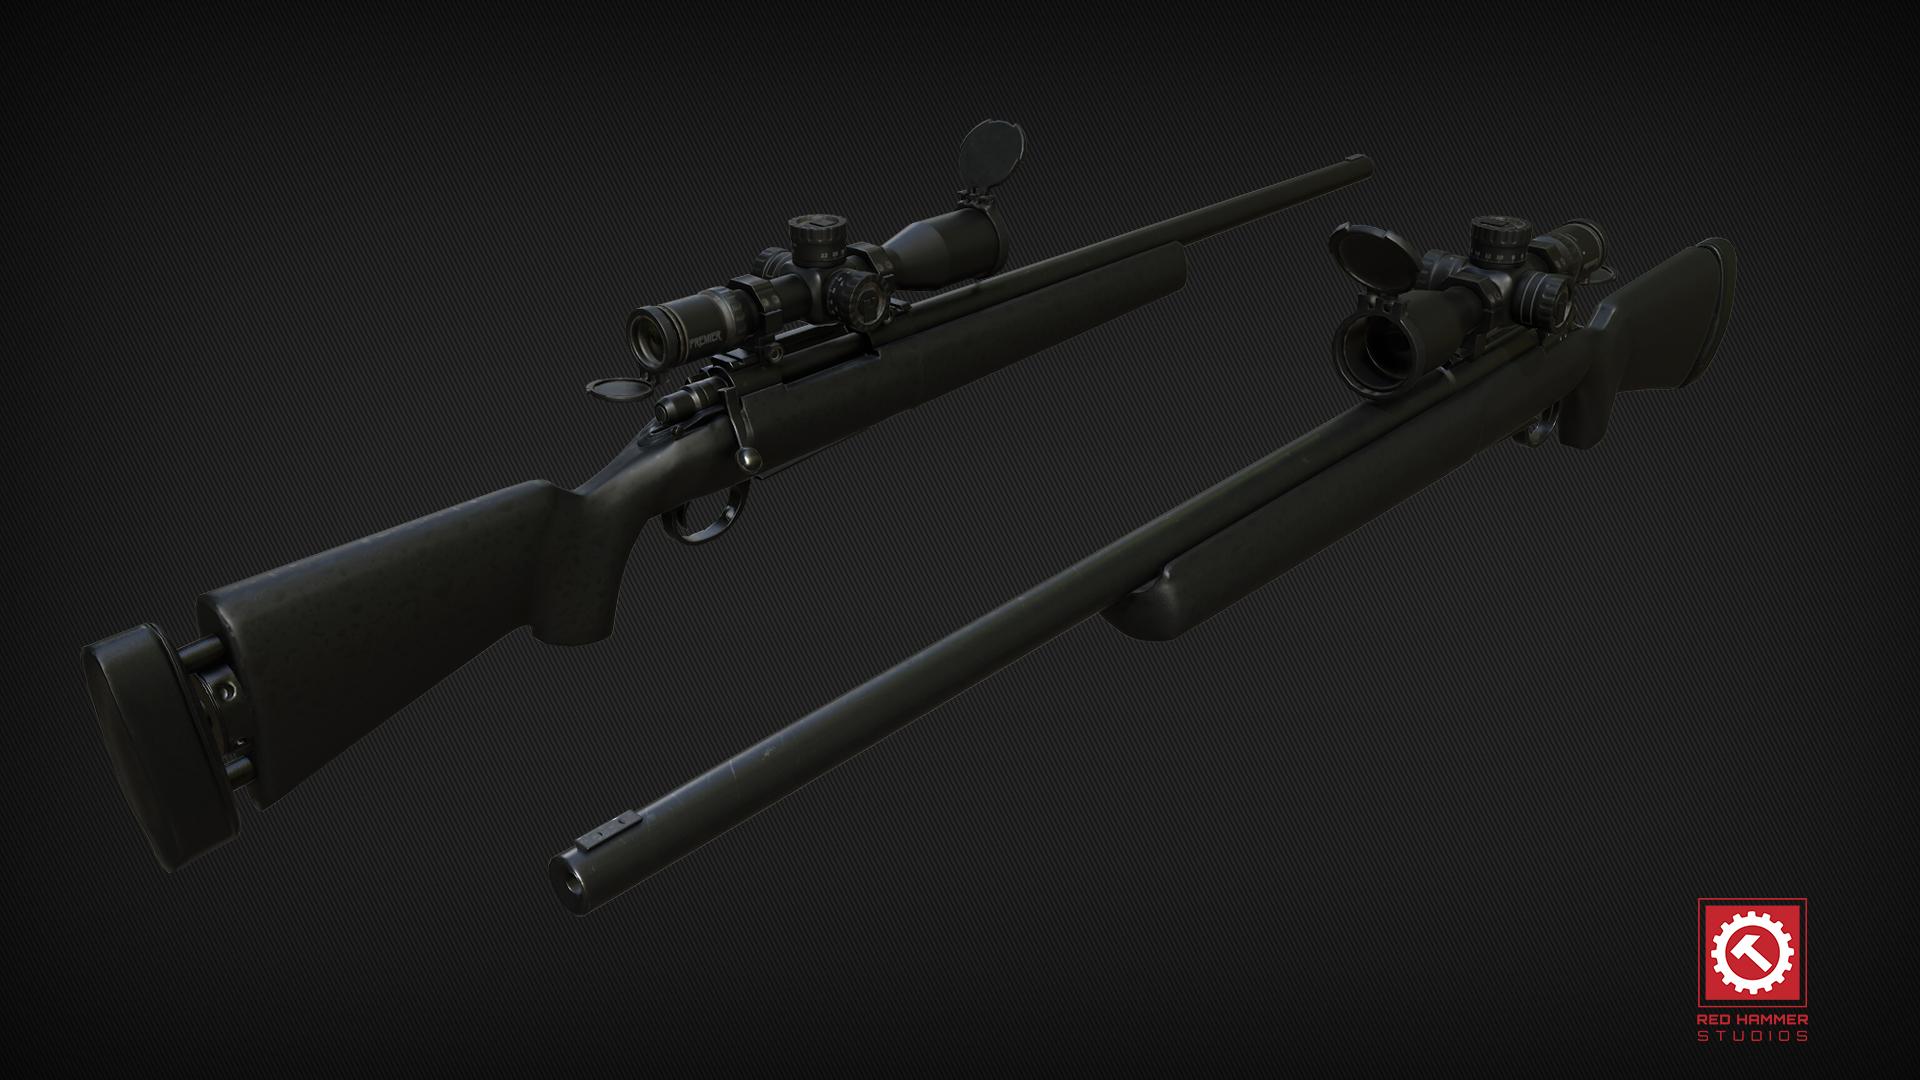 Zee - M107 - announcement - ARMA 3 - ADDONS & MODS